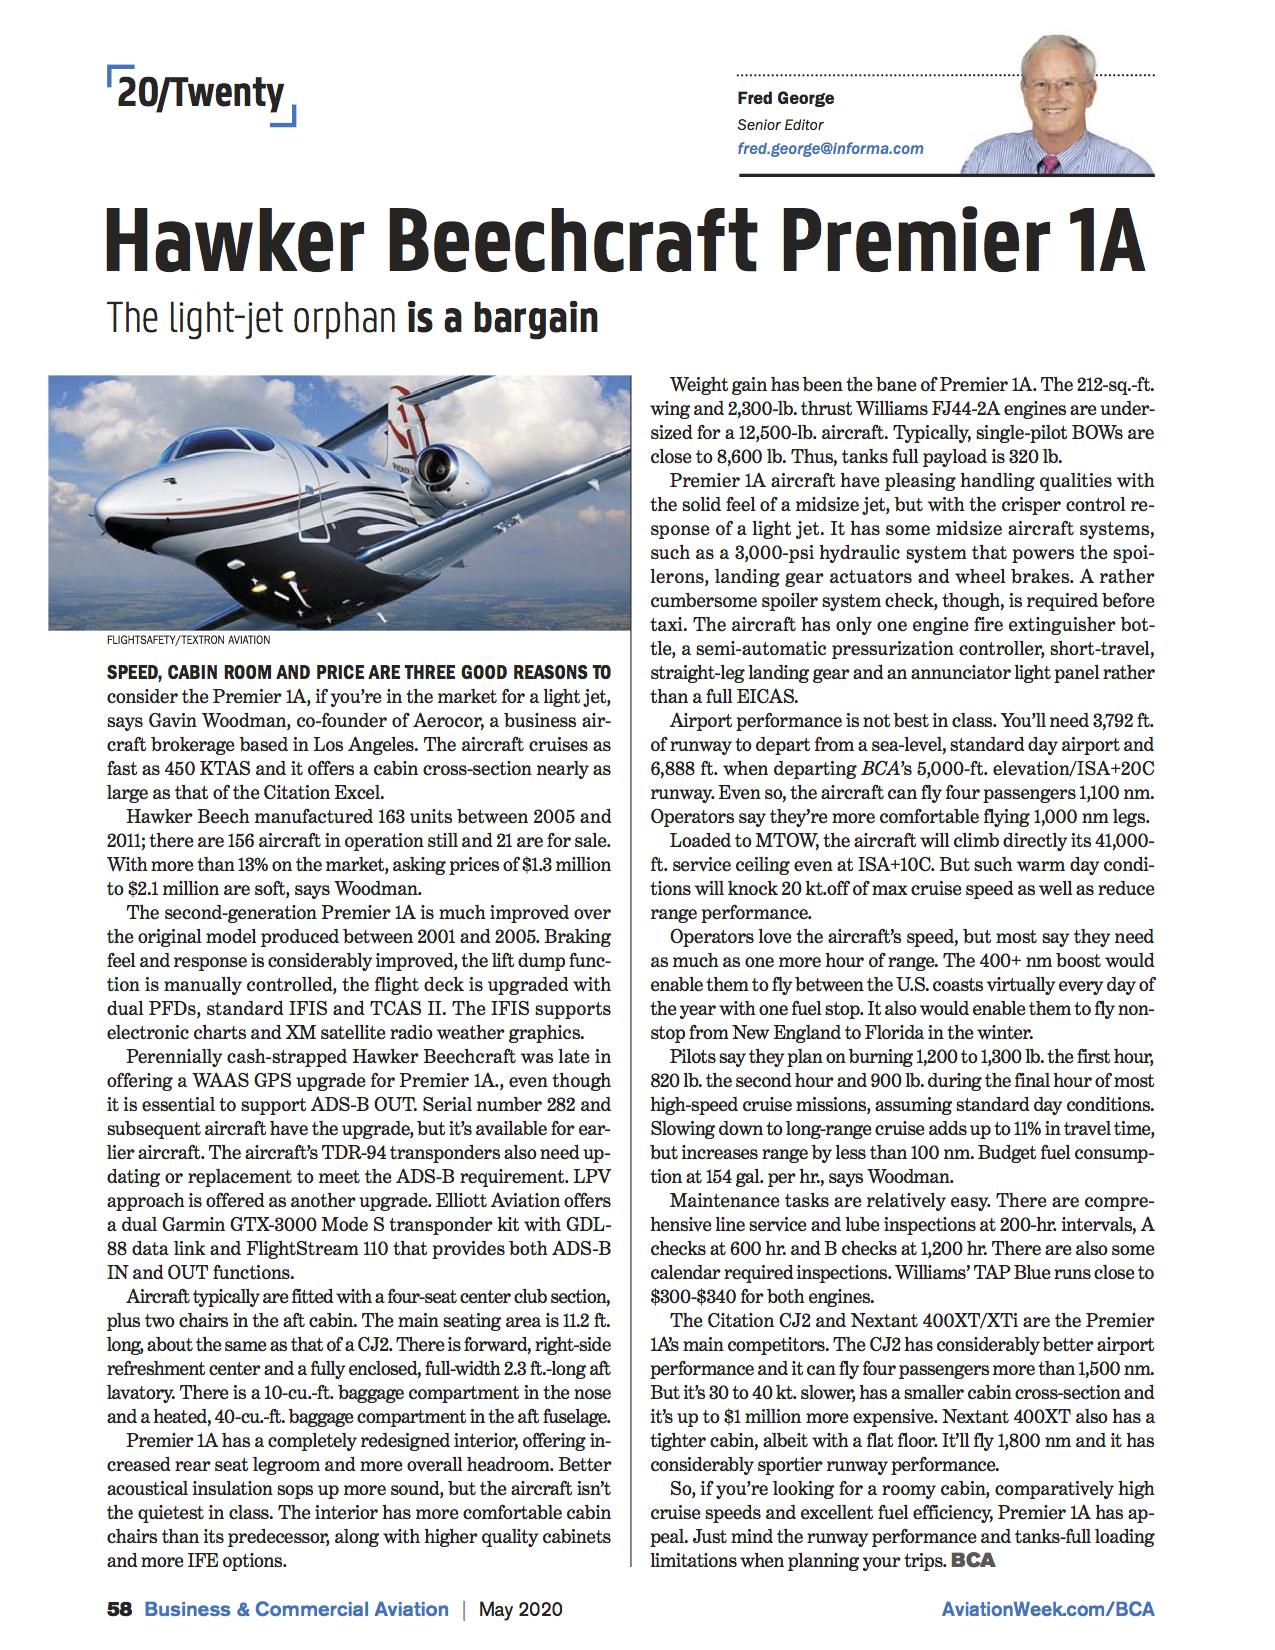 AEROCOR - Hawker Beechcraft Premier IA - Article